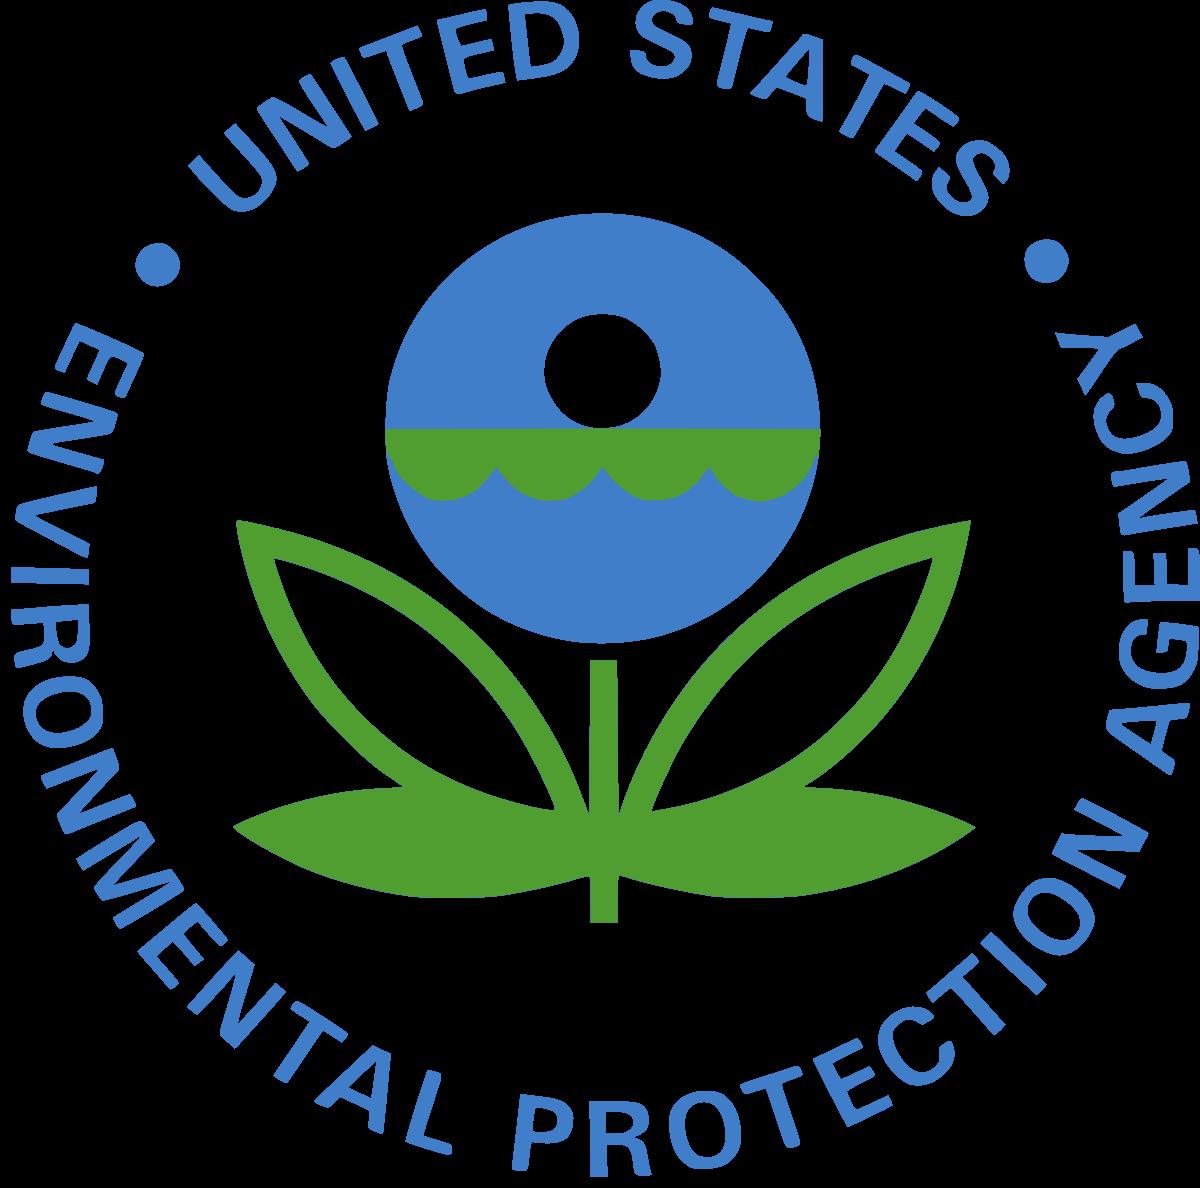 Environmental protection.